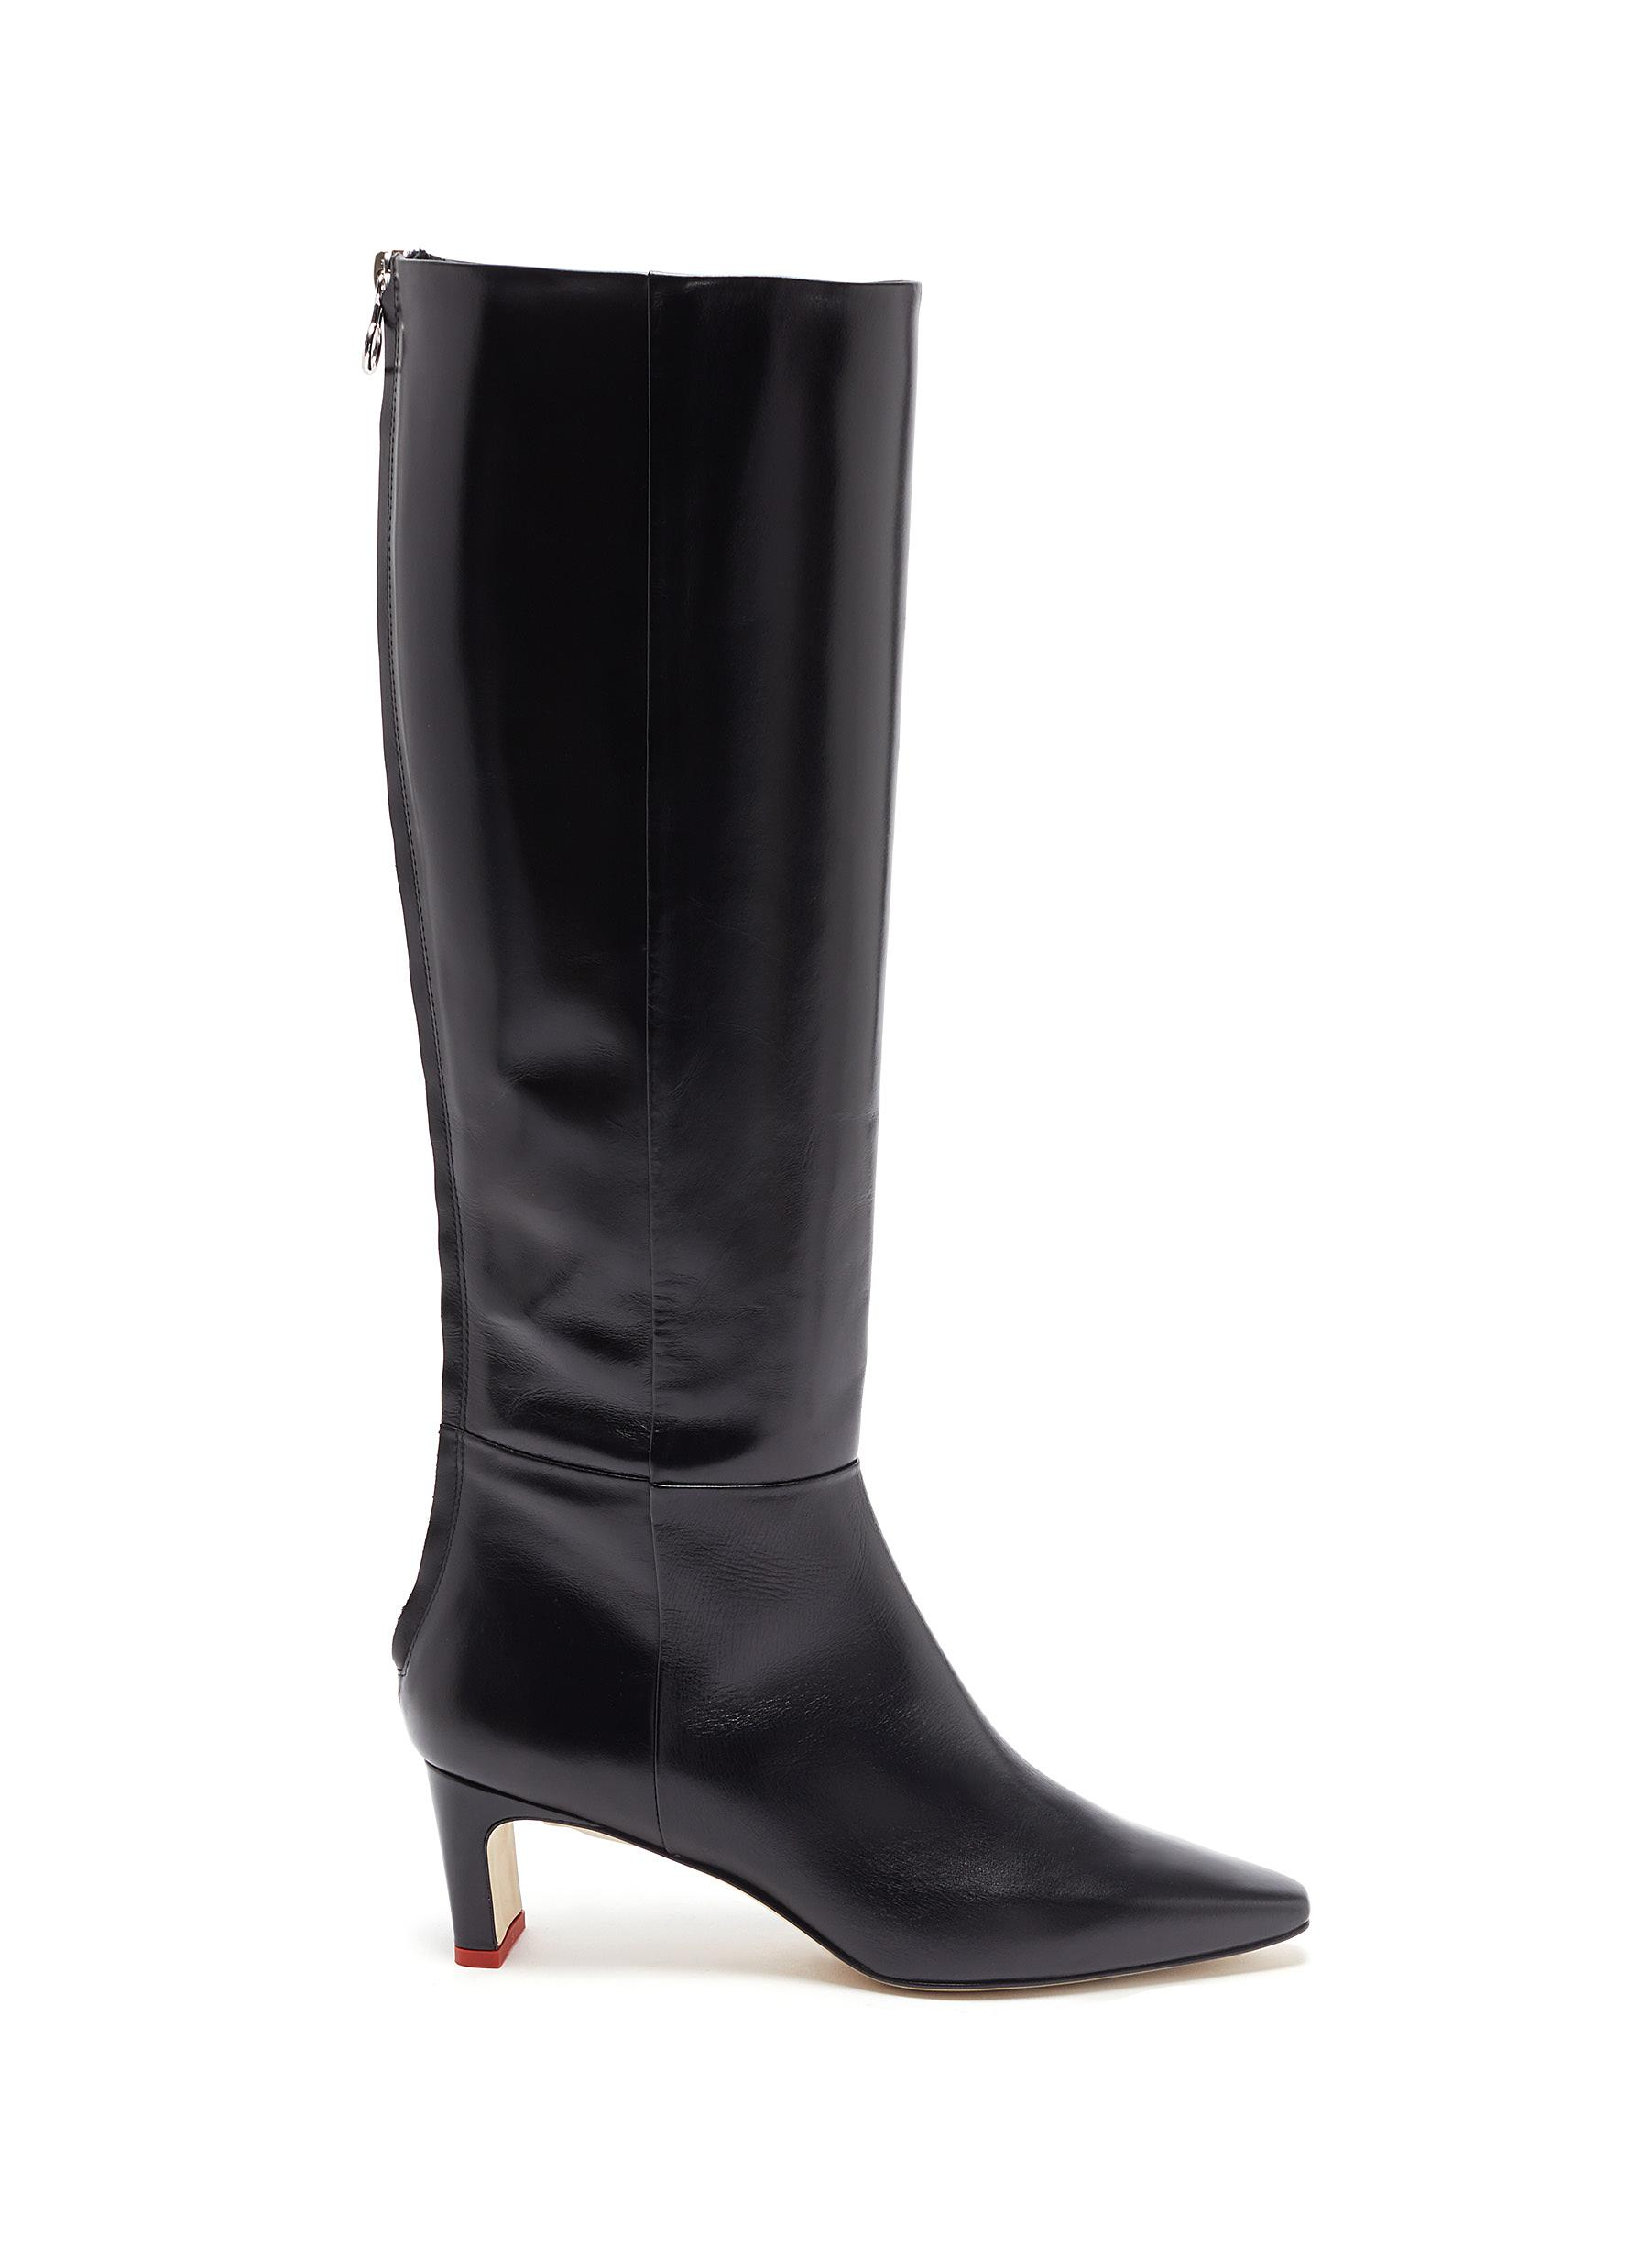 Aeyde Boots Sidney thin block heel calfskin leather knee high boots